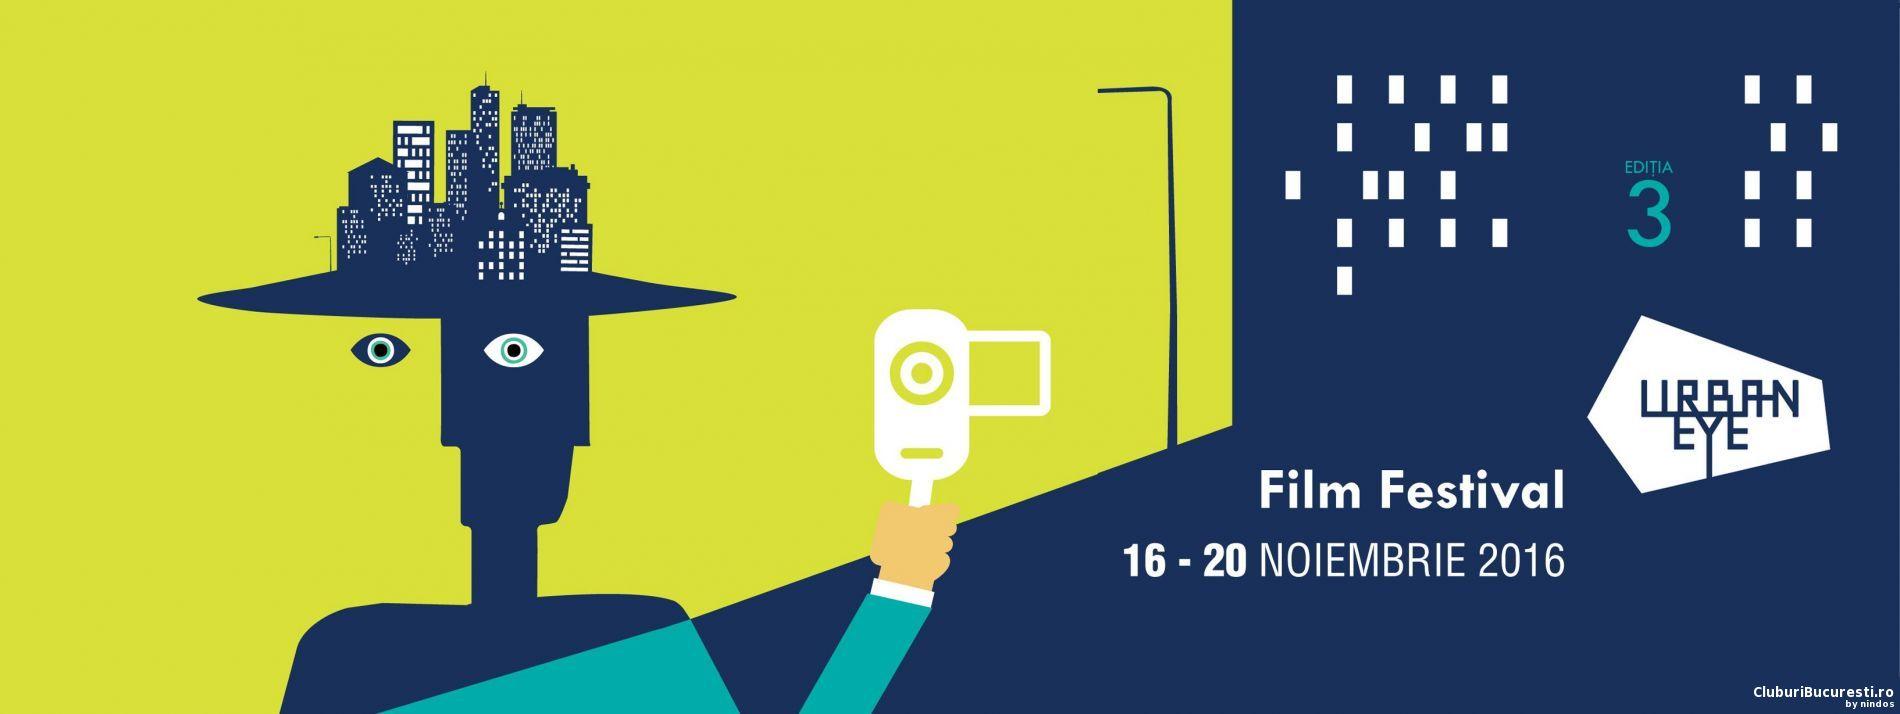 UrbanEye Film Festival la cea de-a treia ediție